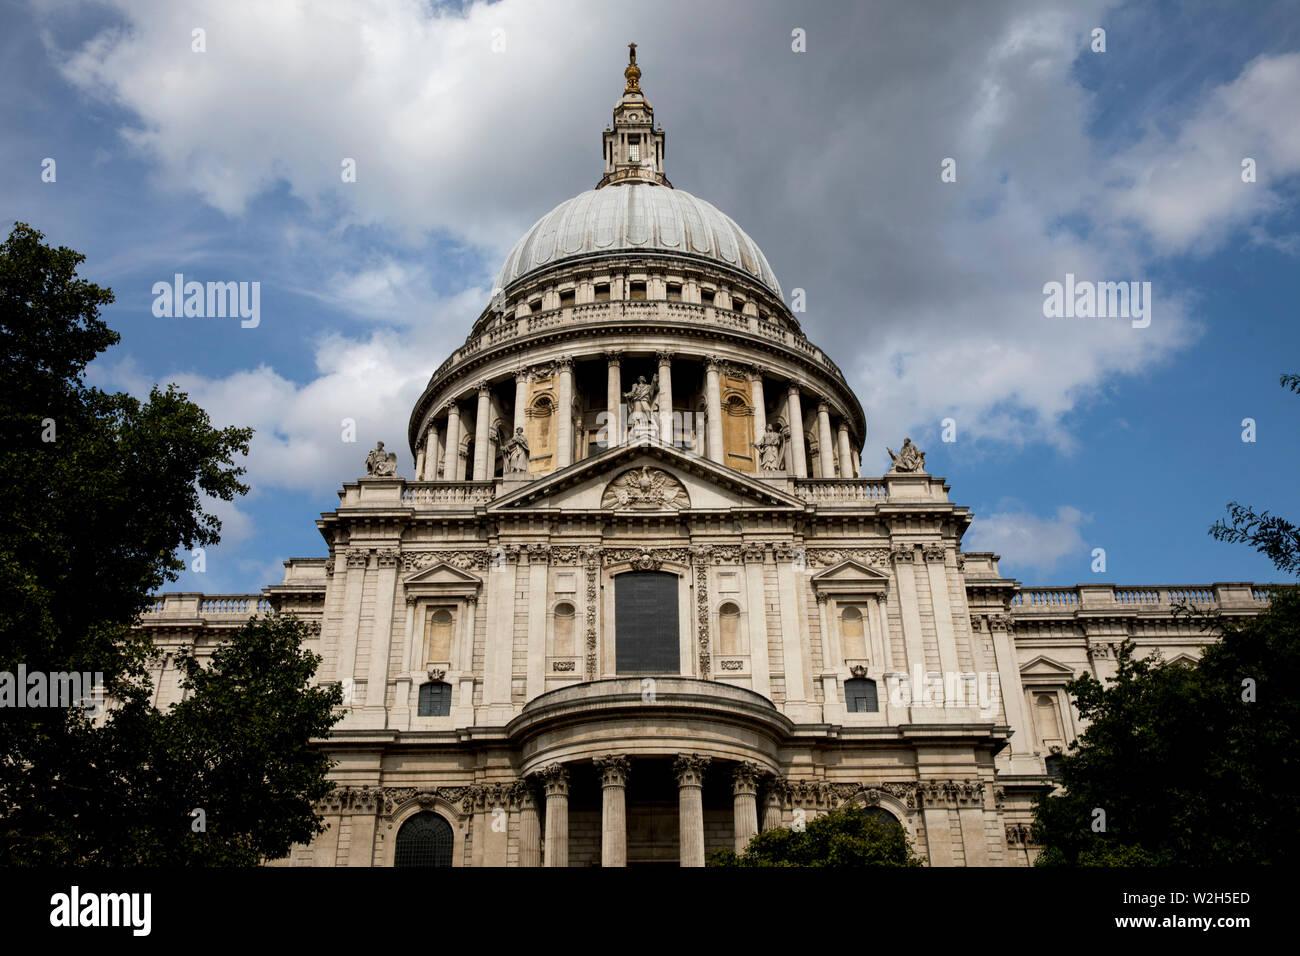 Saint Paul's cathedral, London, U.K. Stock Photo